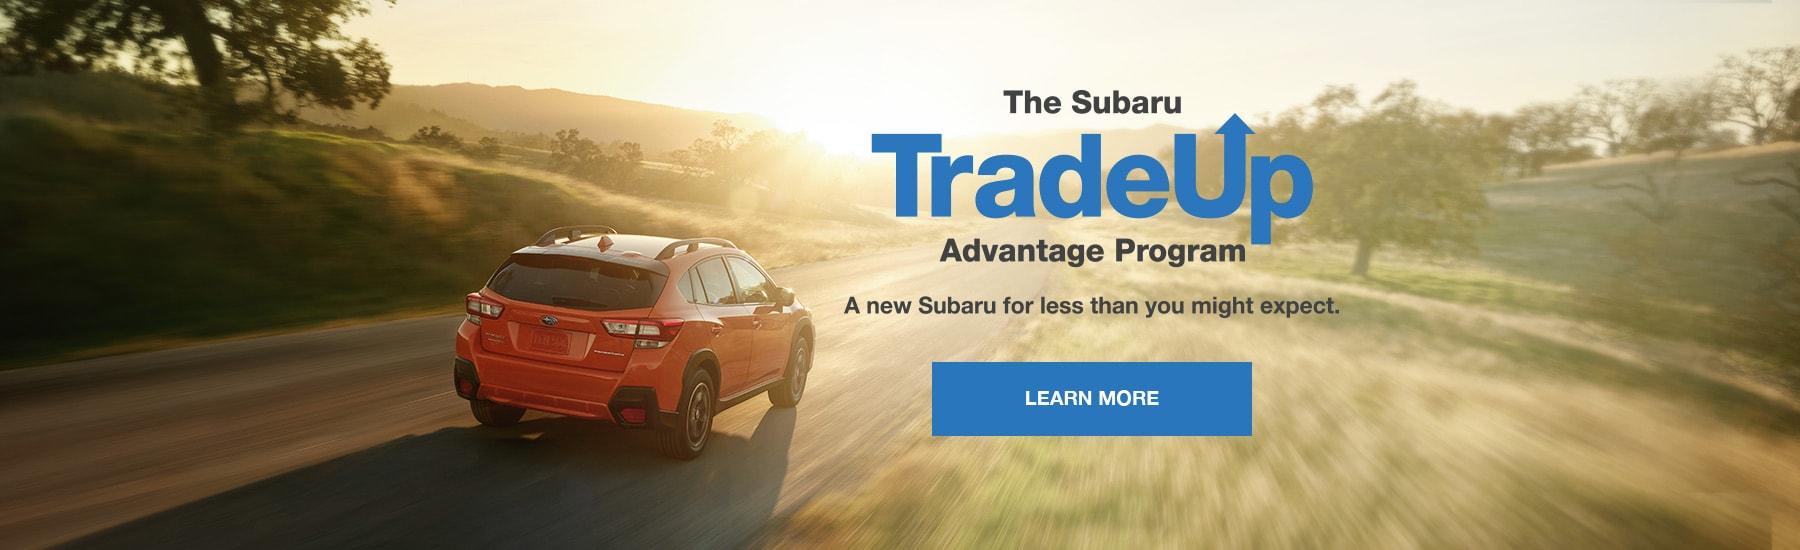 Subaru Dealers In Ct >> New Subaru Used Car Dealer Milford Ct Serving Branford